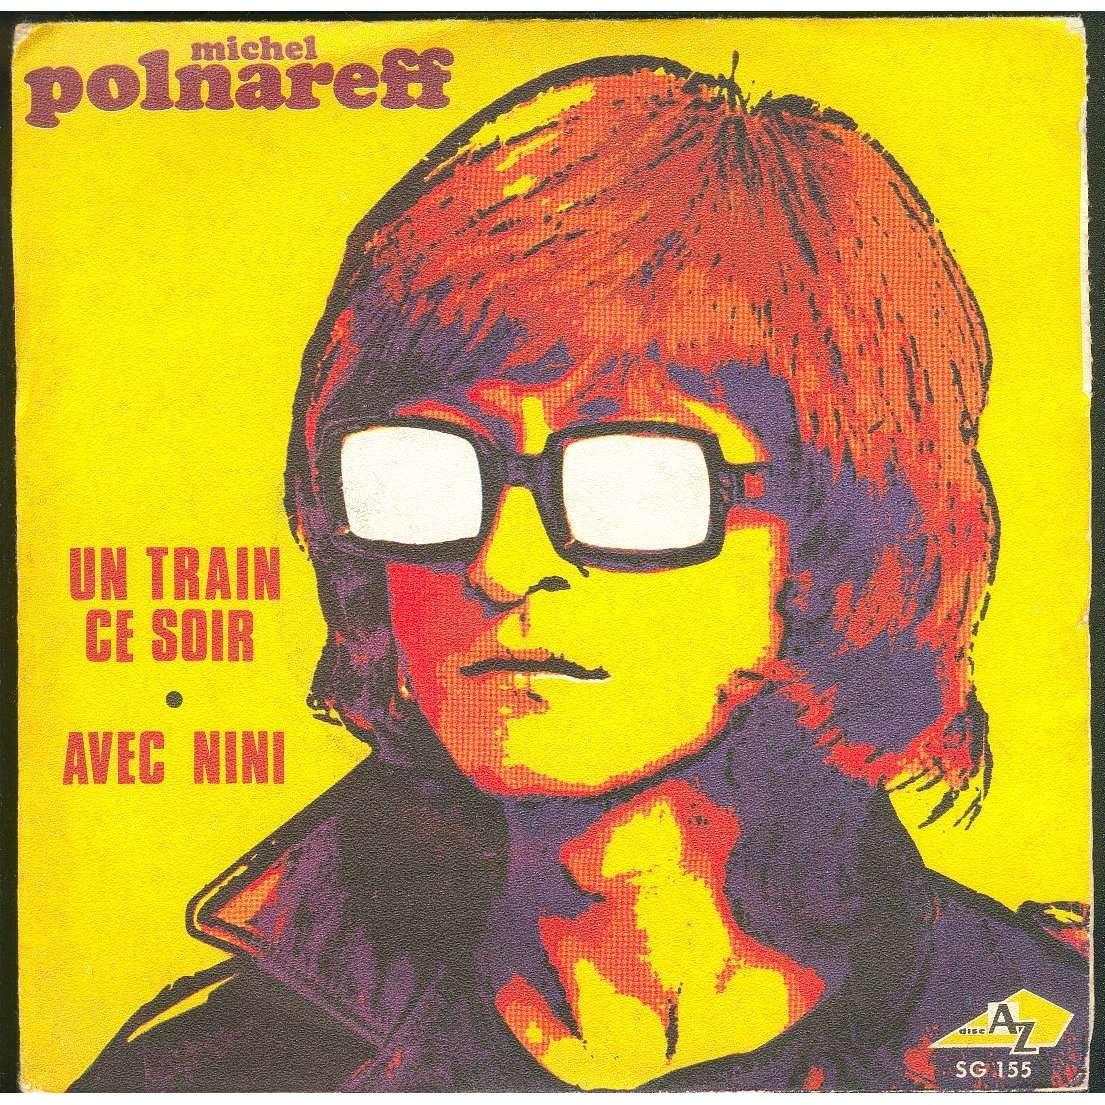 Un train ce soir michel polnareff 7 39 39 sp for Un hotel ce soir